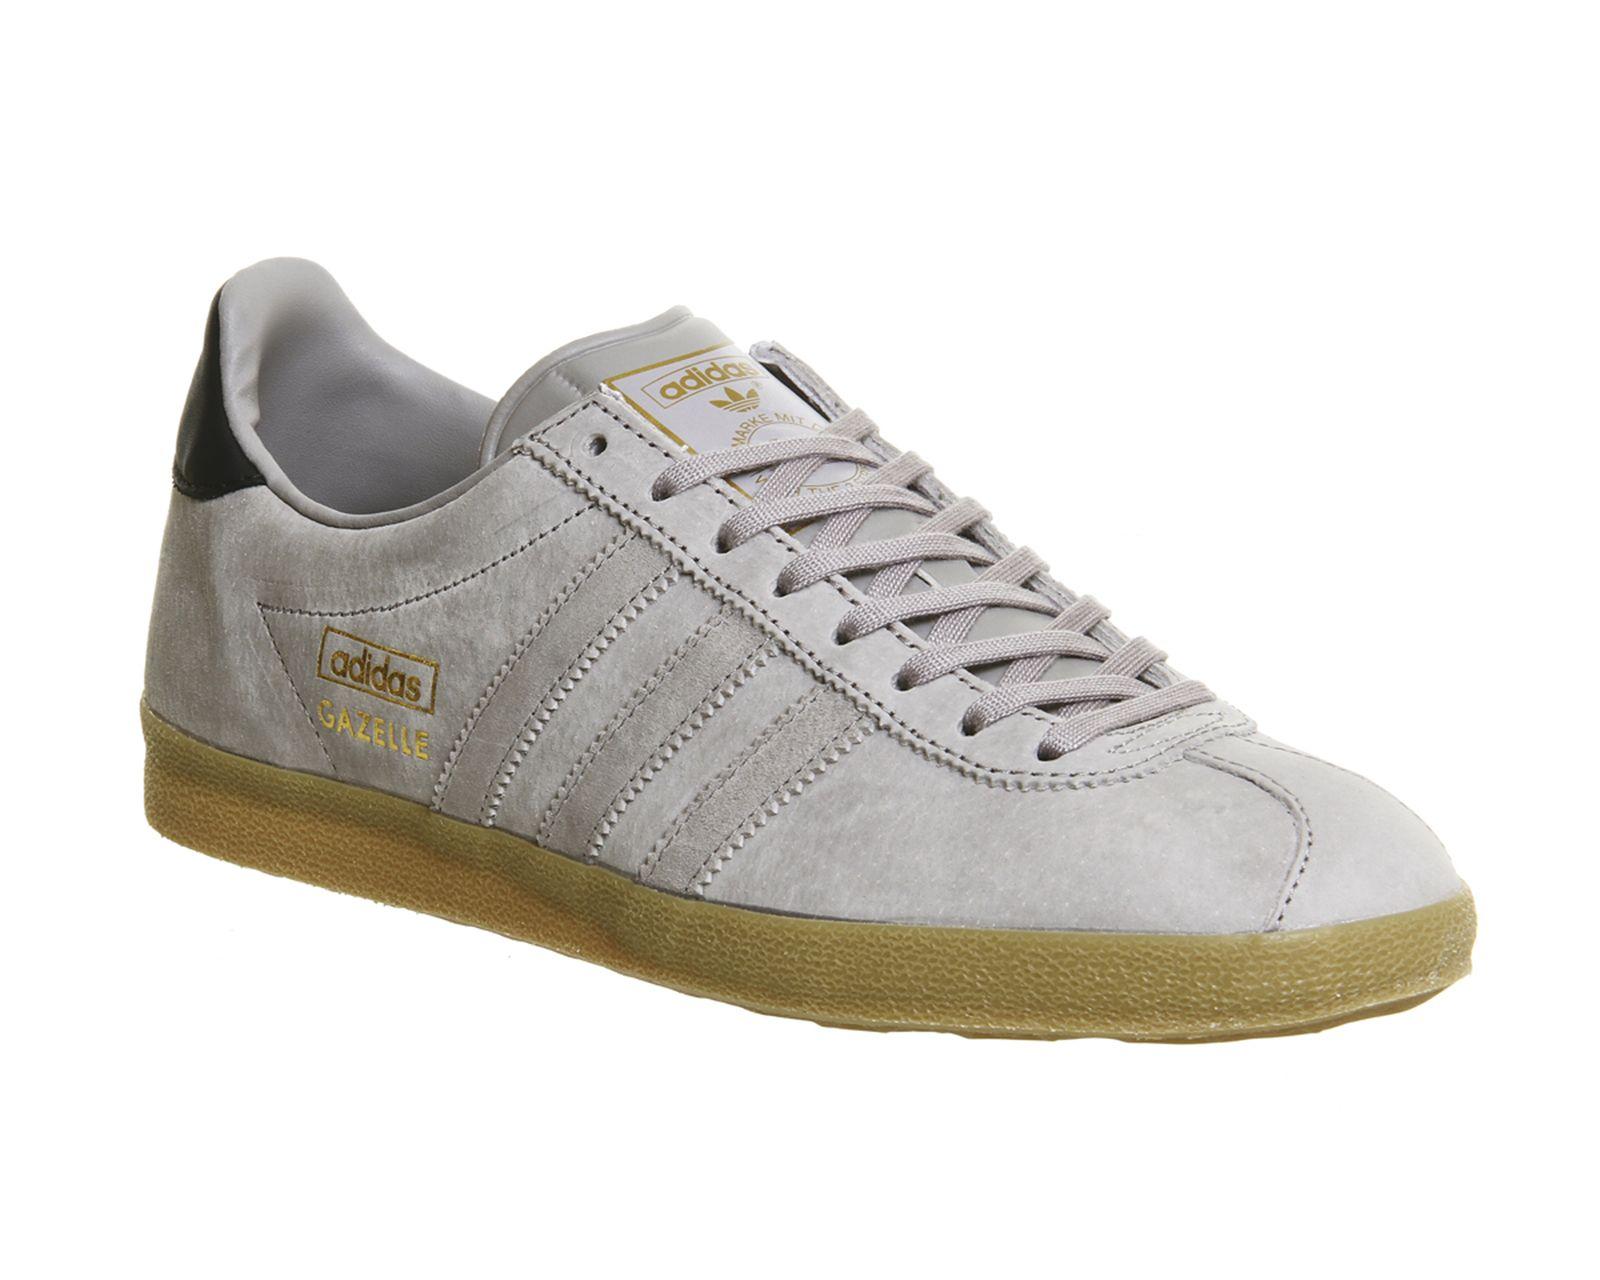 adidas gazelle light grey cork